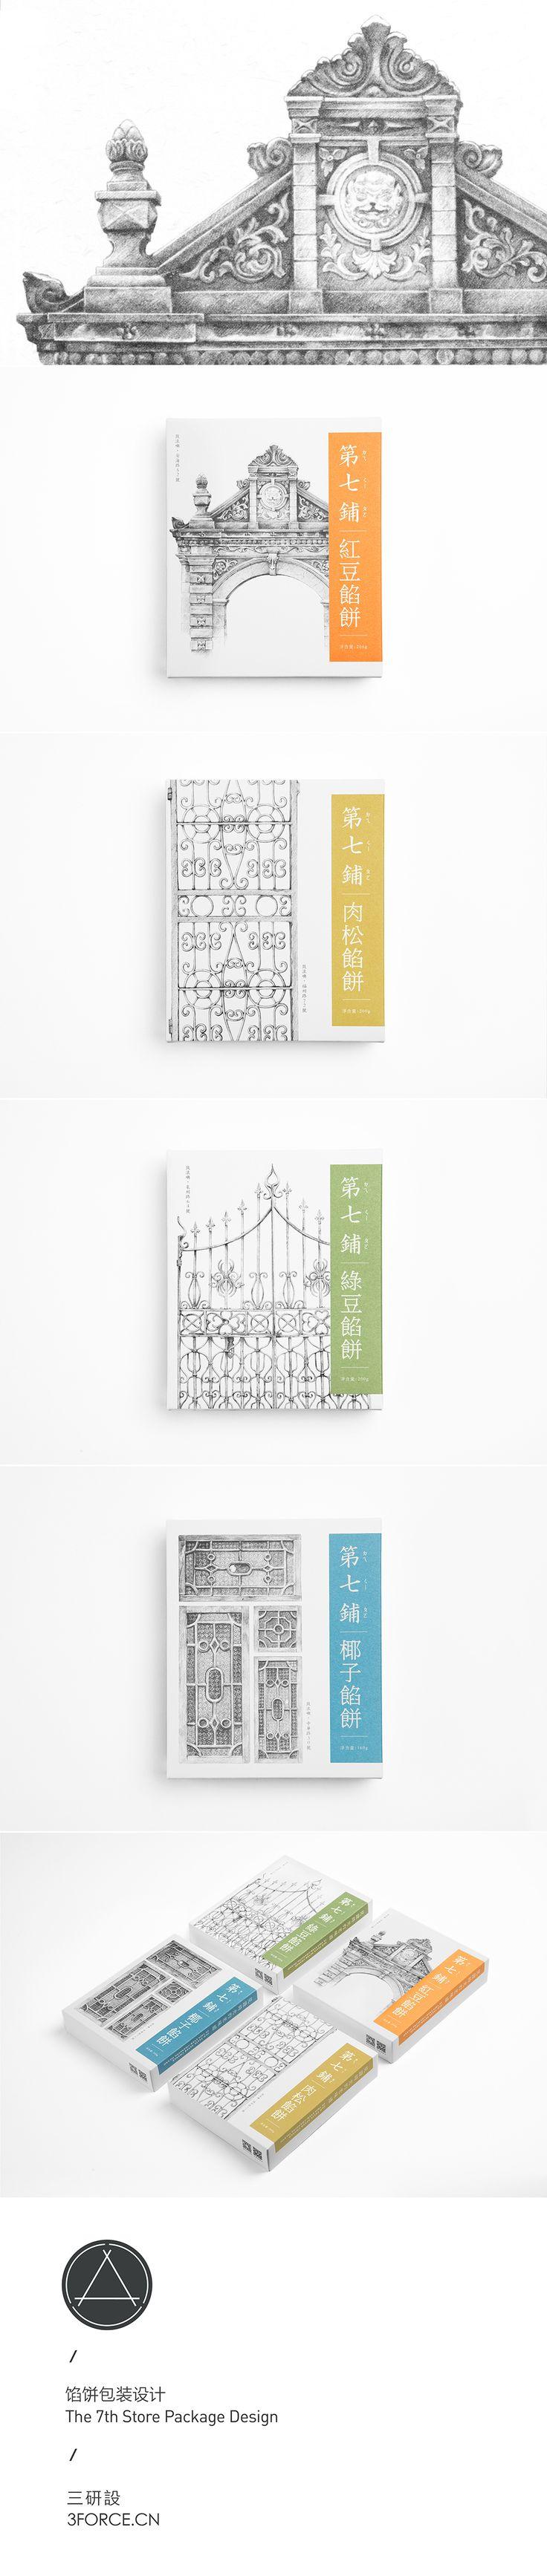 The 7th Store Pie Packaging by 3Force 三研設 Xiamen, China 第七鋪餡餅包裝設計 on Behance PD